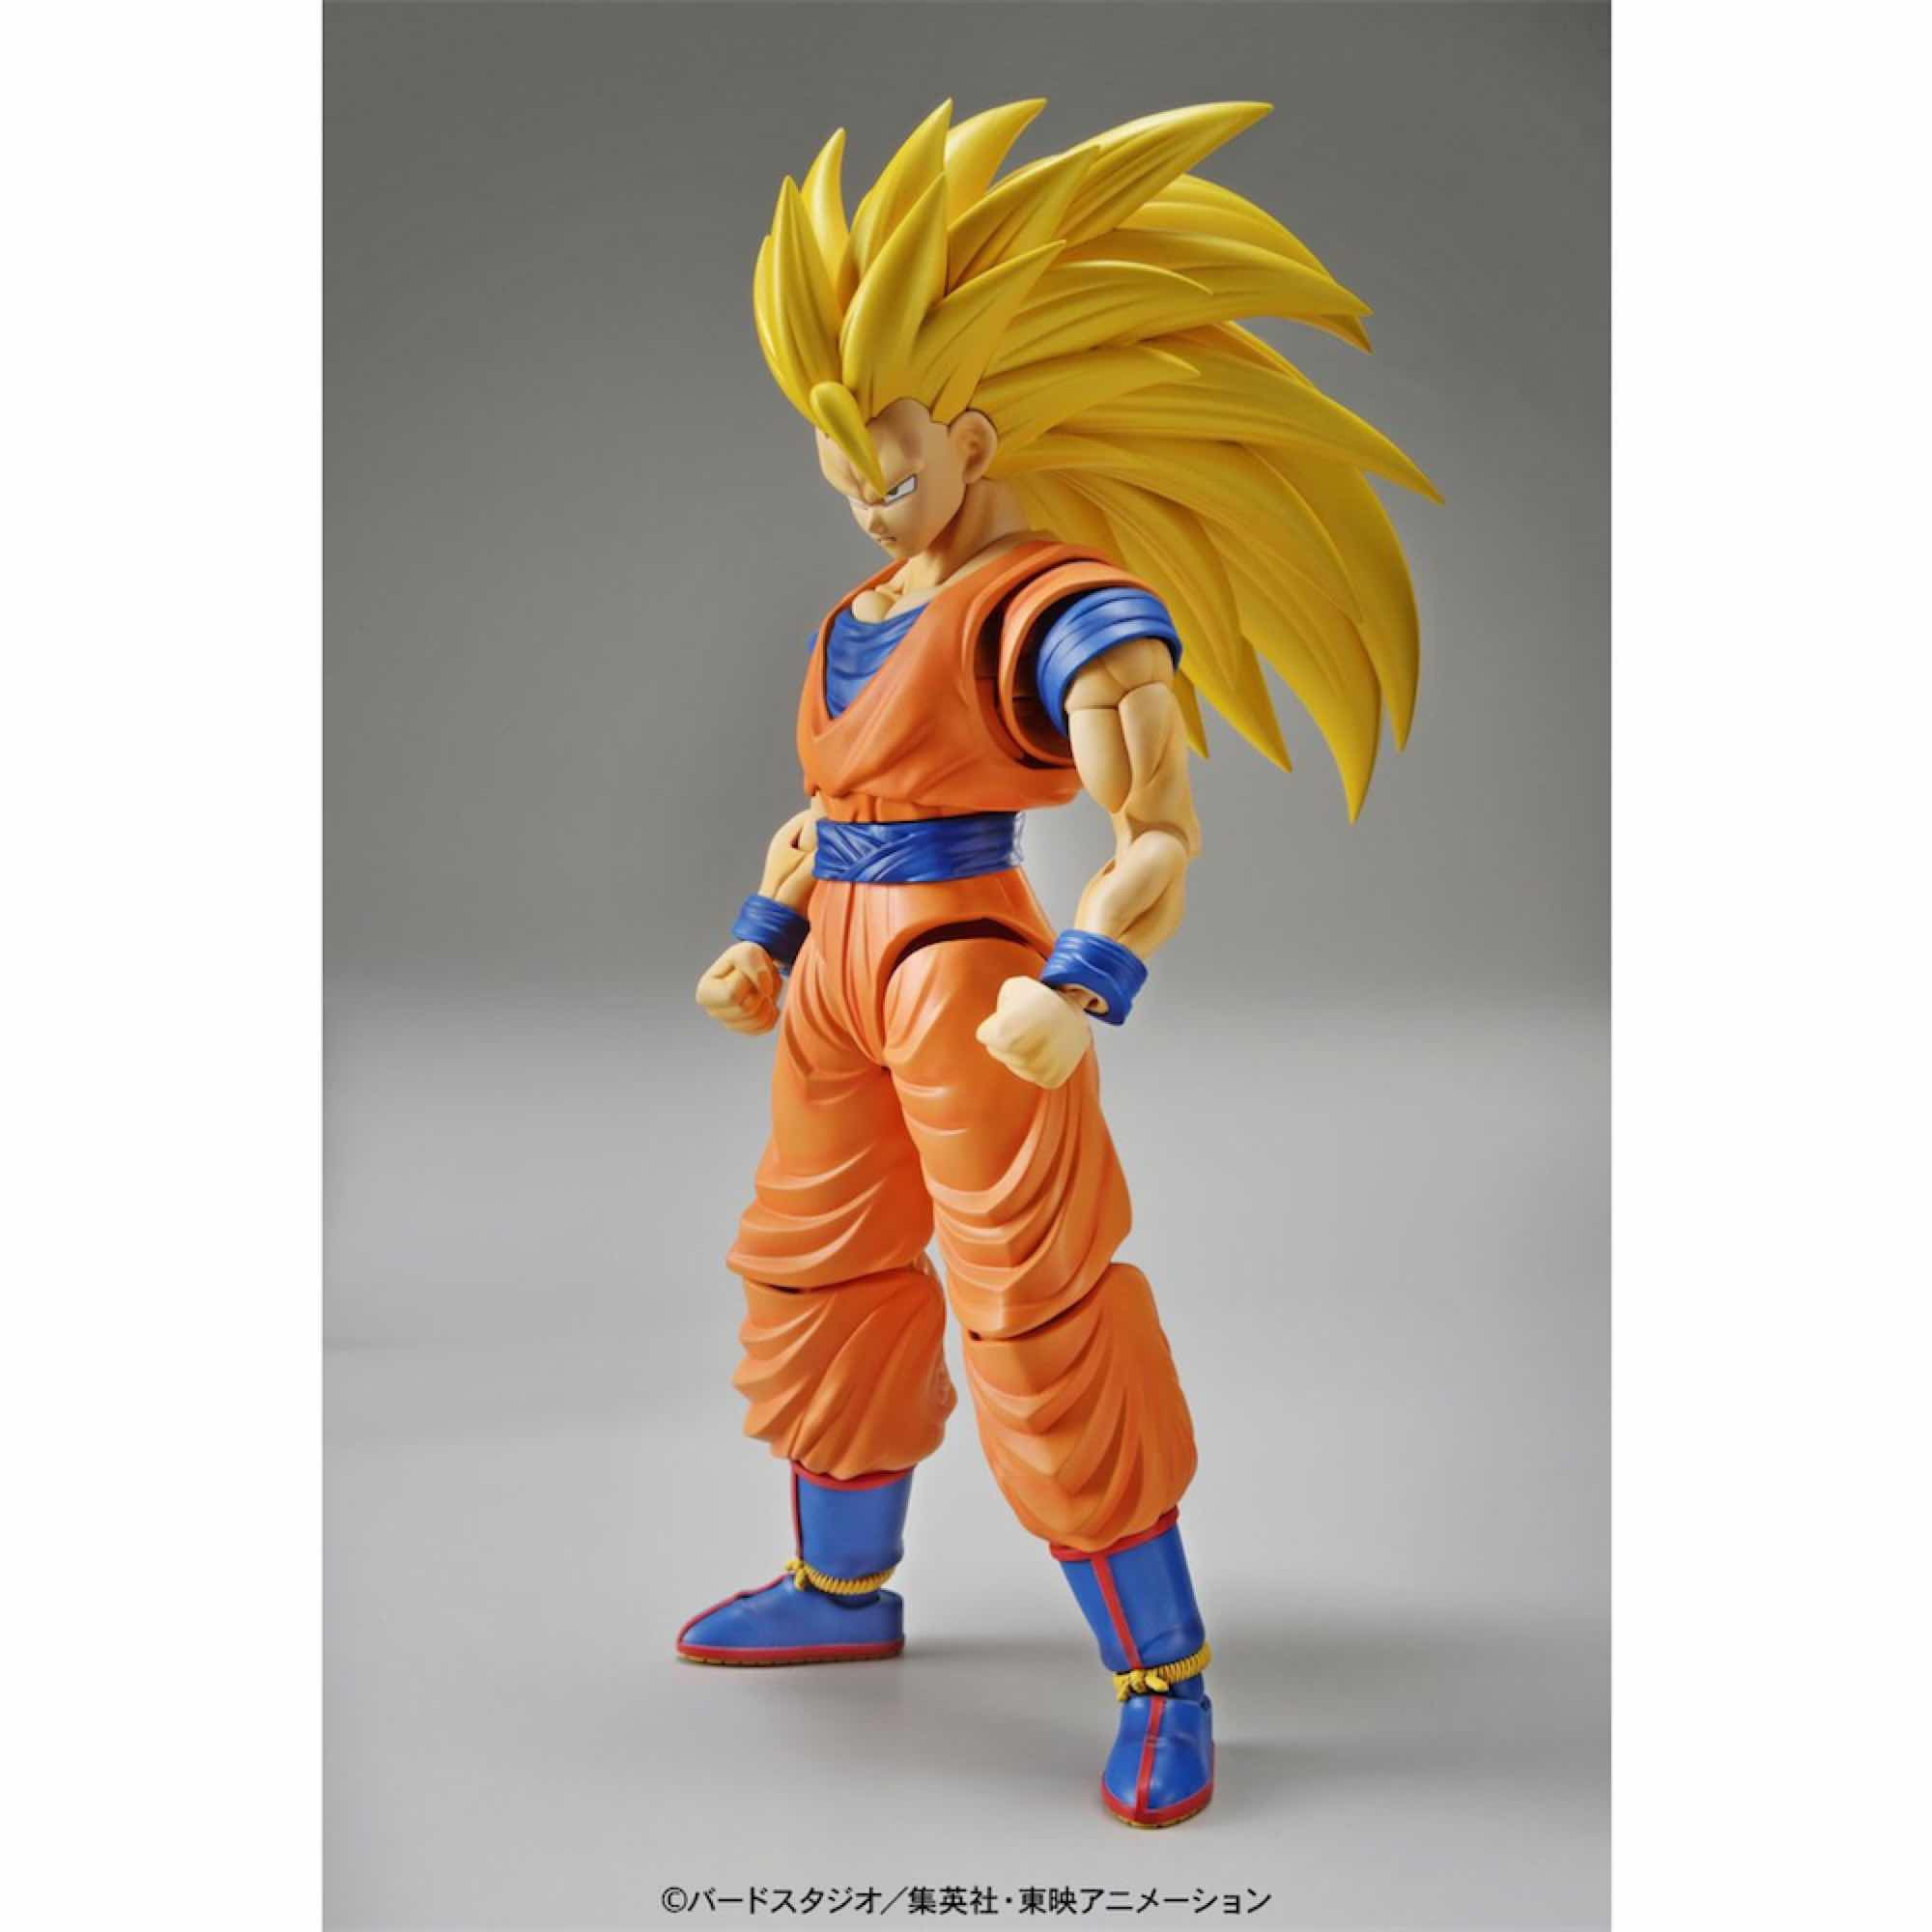 SON GOKU SUPER SAIYAN 3 MODEL KIT FIGURA 14 CM DRAGON BALL Z FIGURE-RISE STANDARD